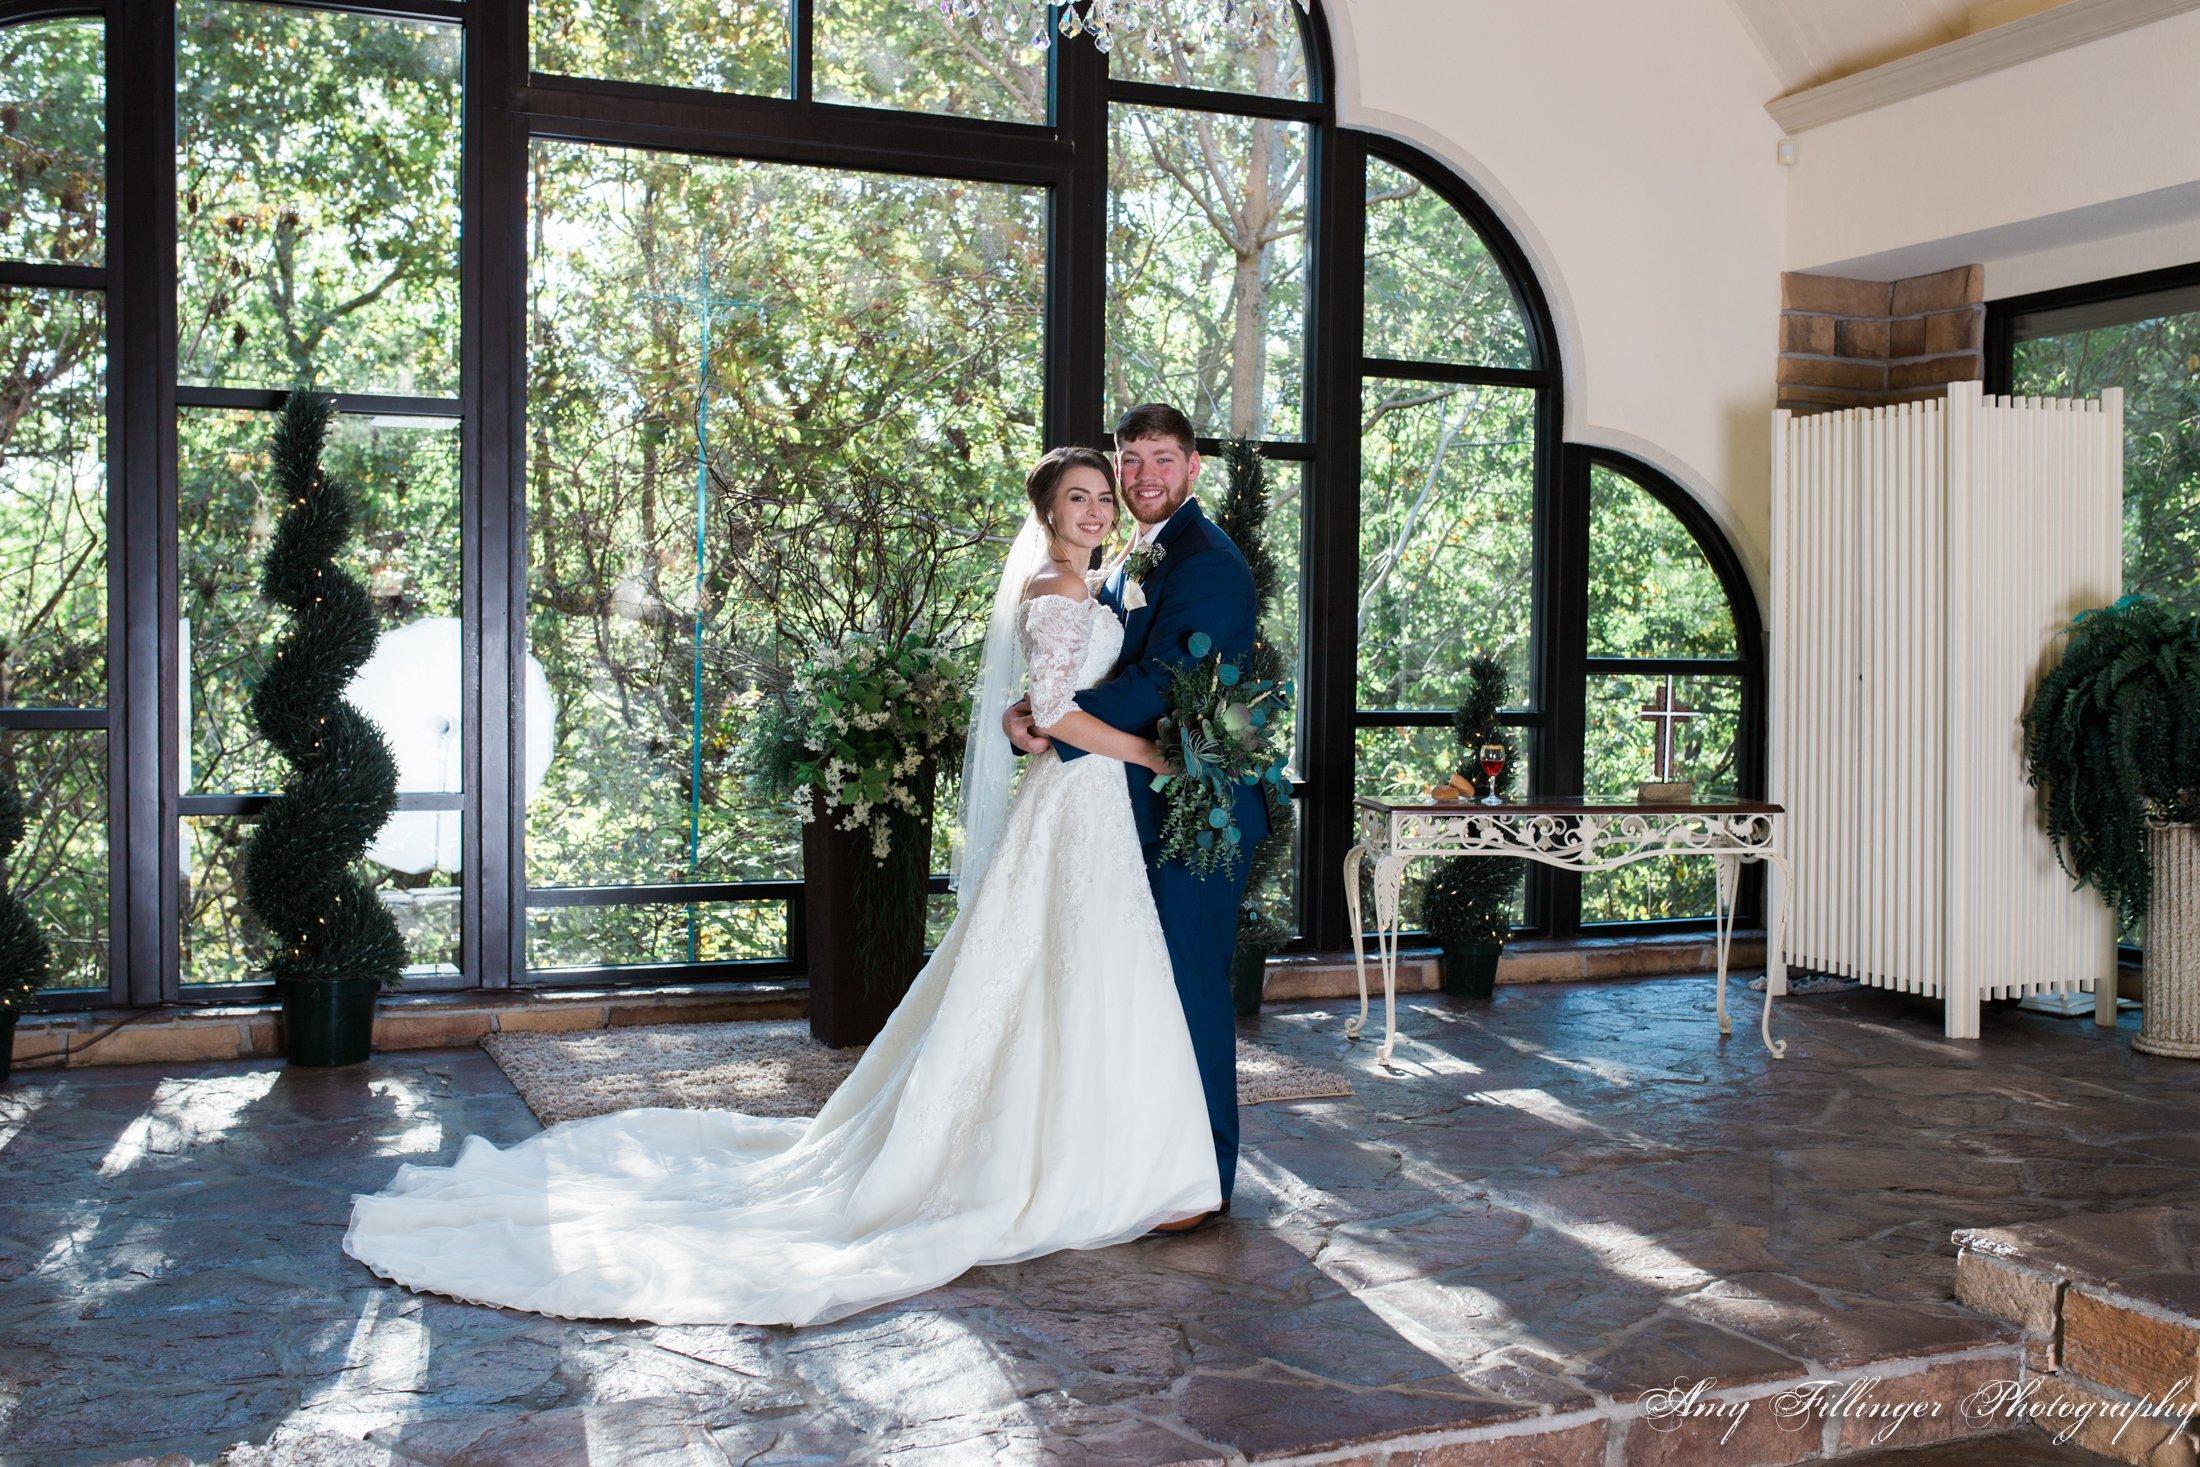 Makayla and Chandler's beautiful Stonegate Glass Chapel wedding by Branson Wedding Photographer, Amy Fillinger Photography #bransonwedding #bransonweddingphotographer #bransonweddings #bransonbride #weddingplanningideas #bransonmo #destinationweddingphotographer